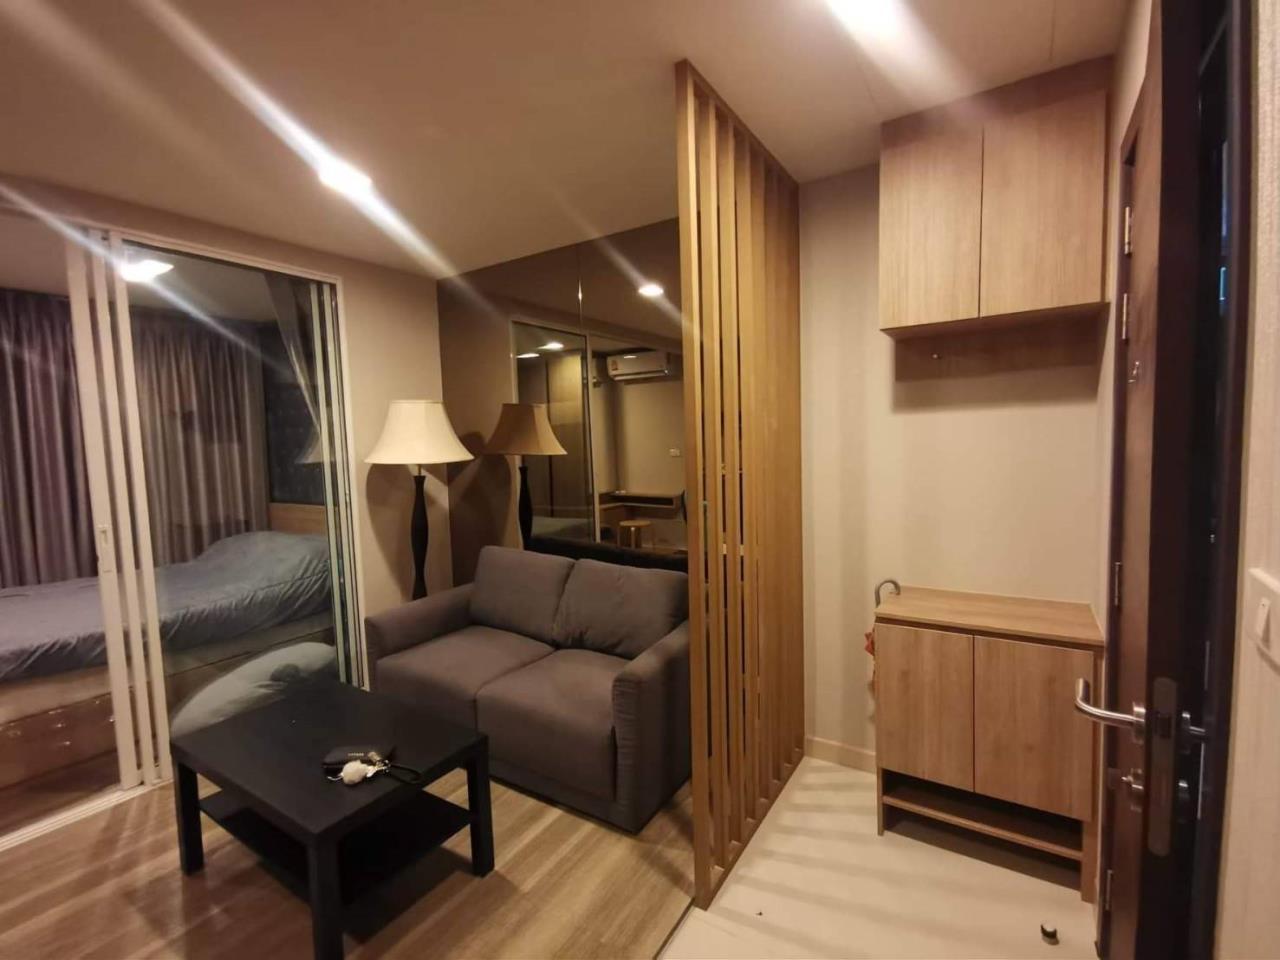 Blueocean property Agency's Condo For Rent – Moniiq Sukhumvit 64  1